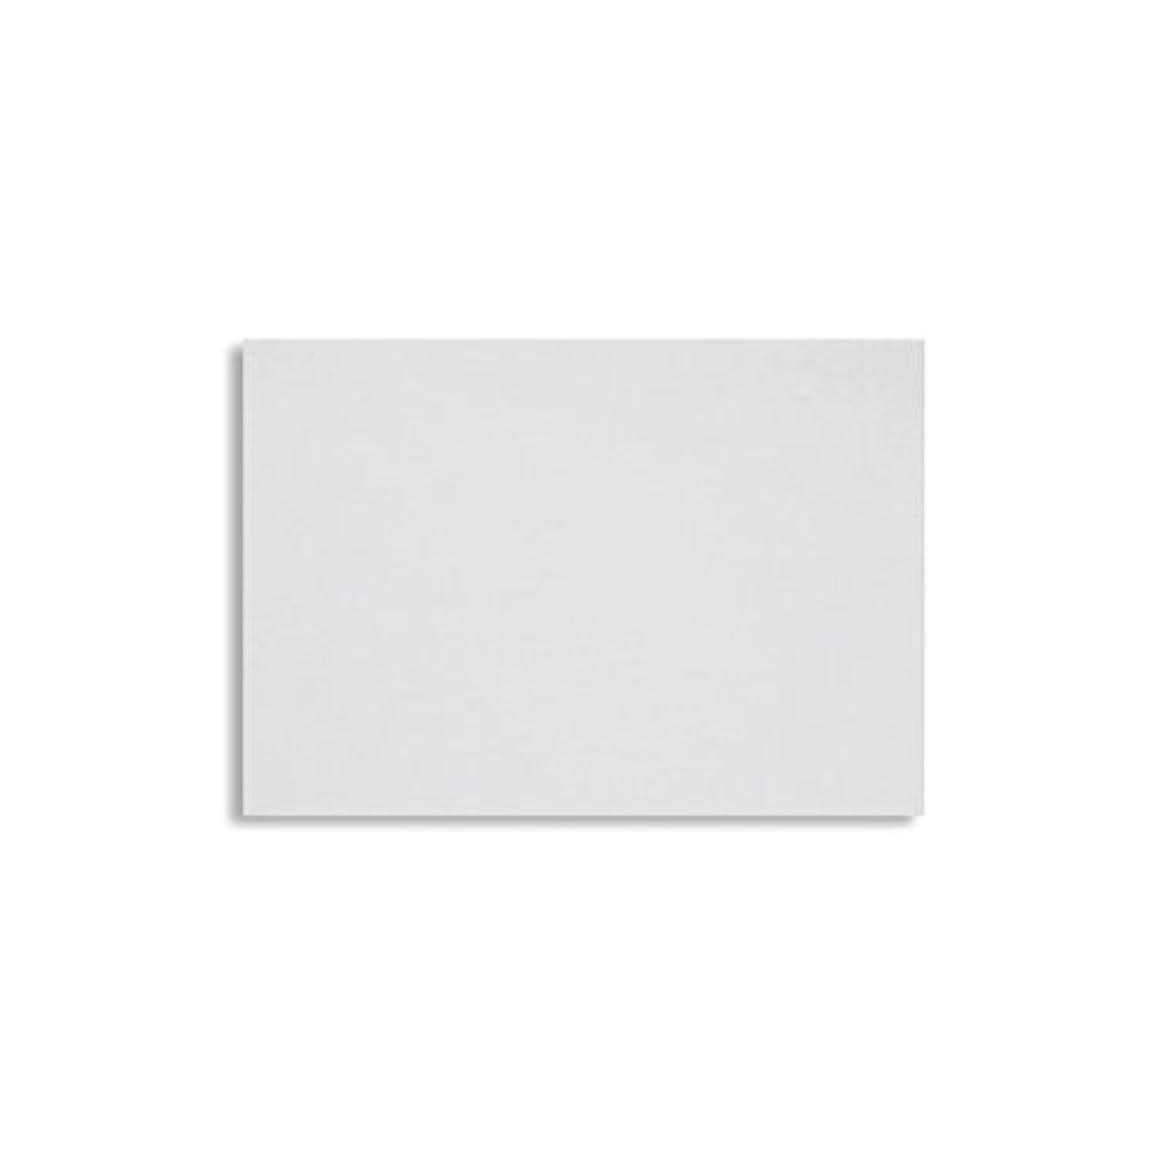 White 3.5